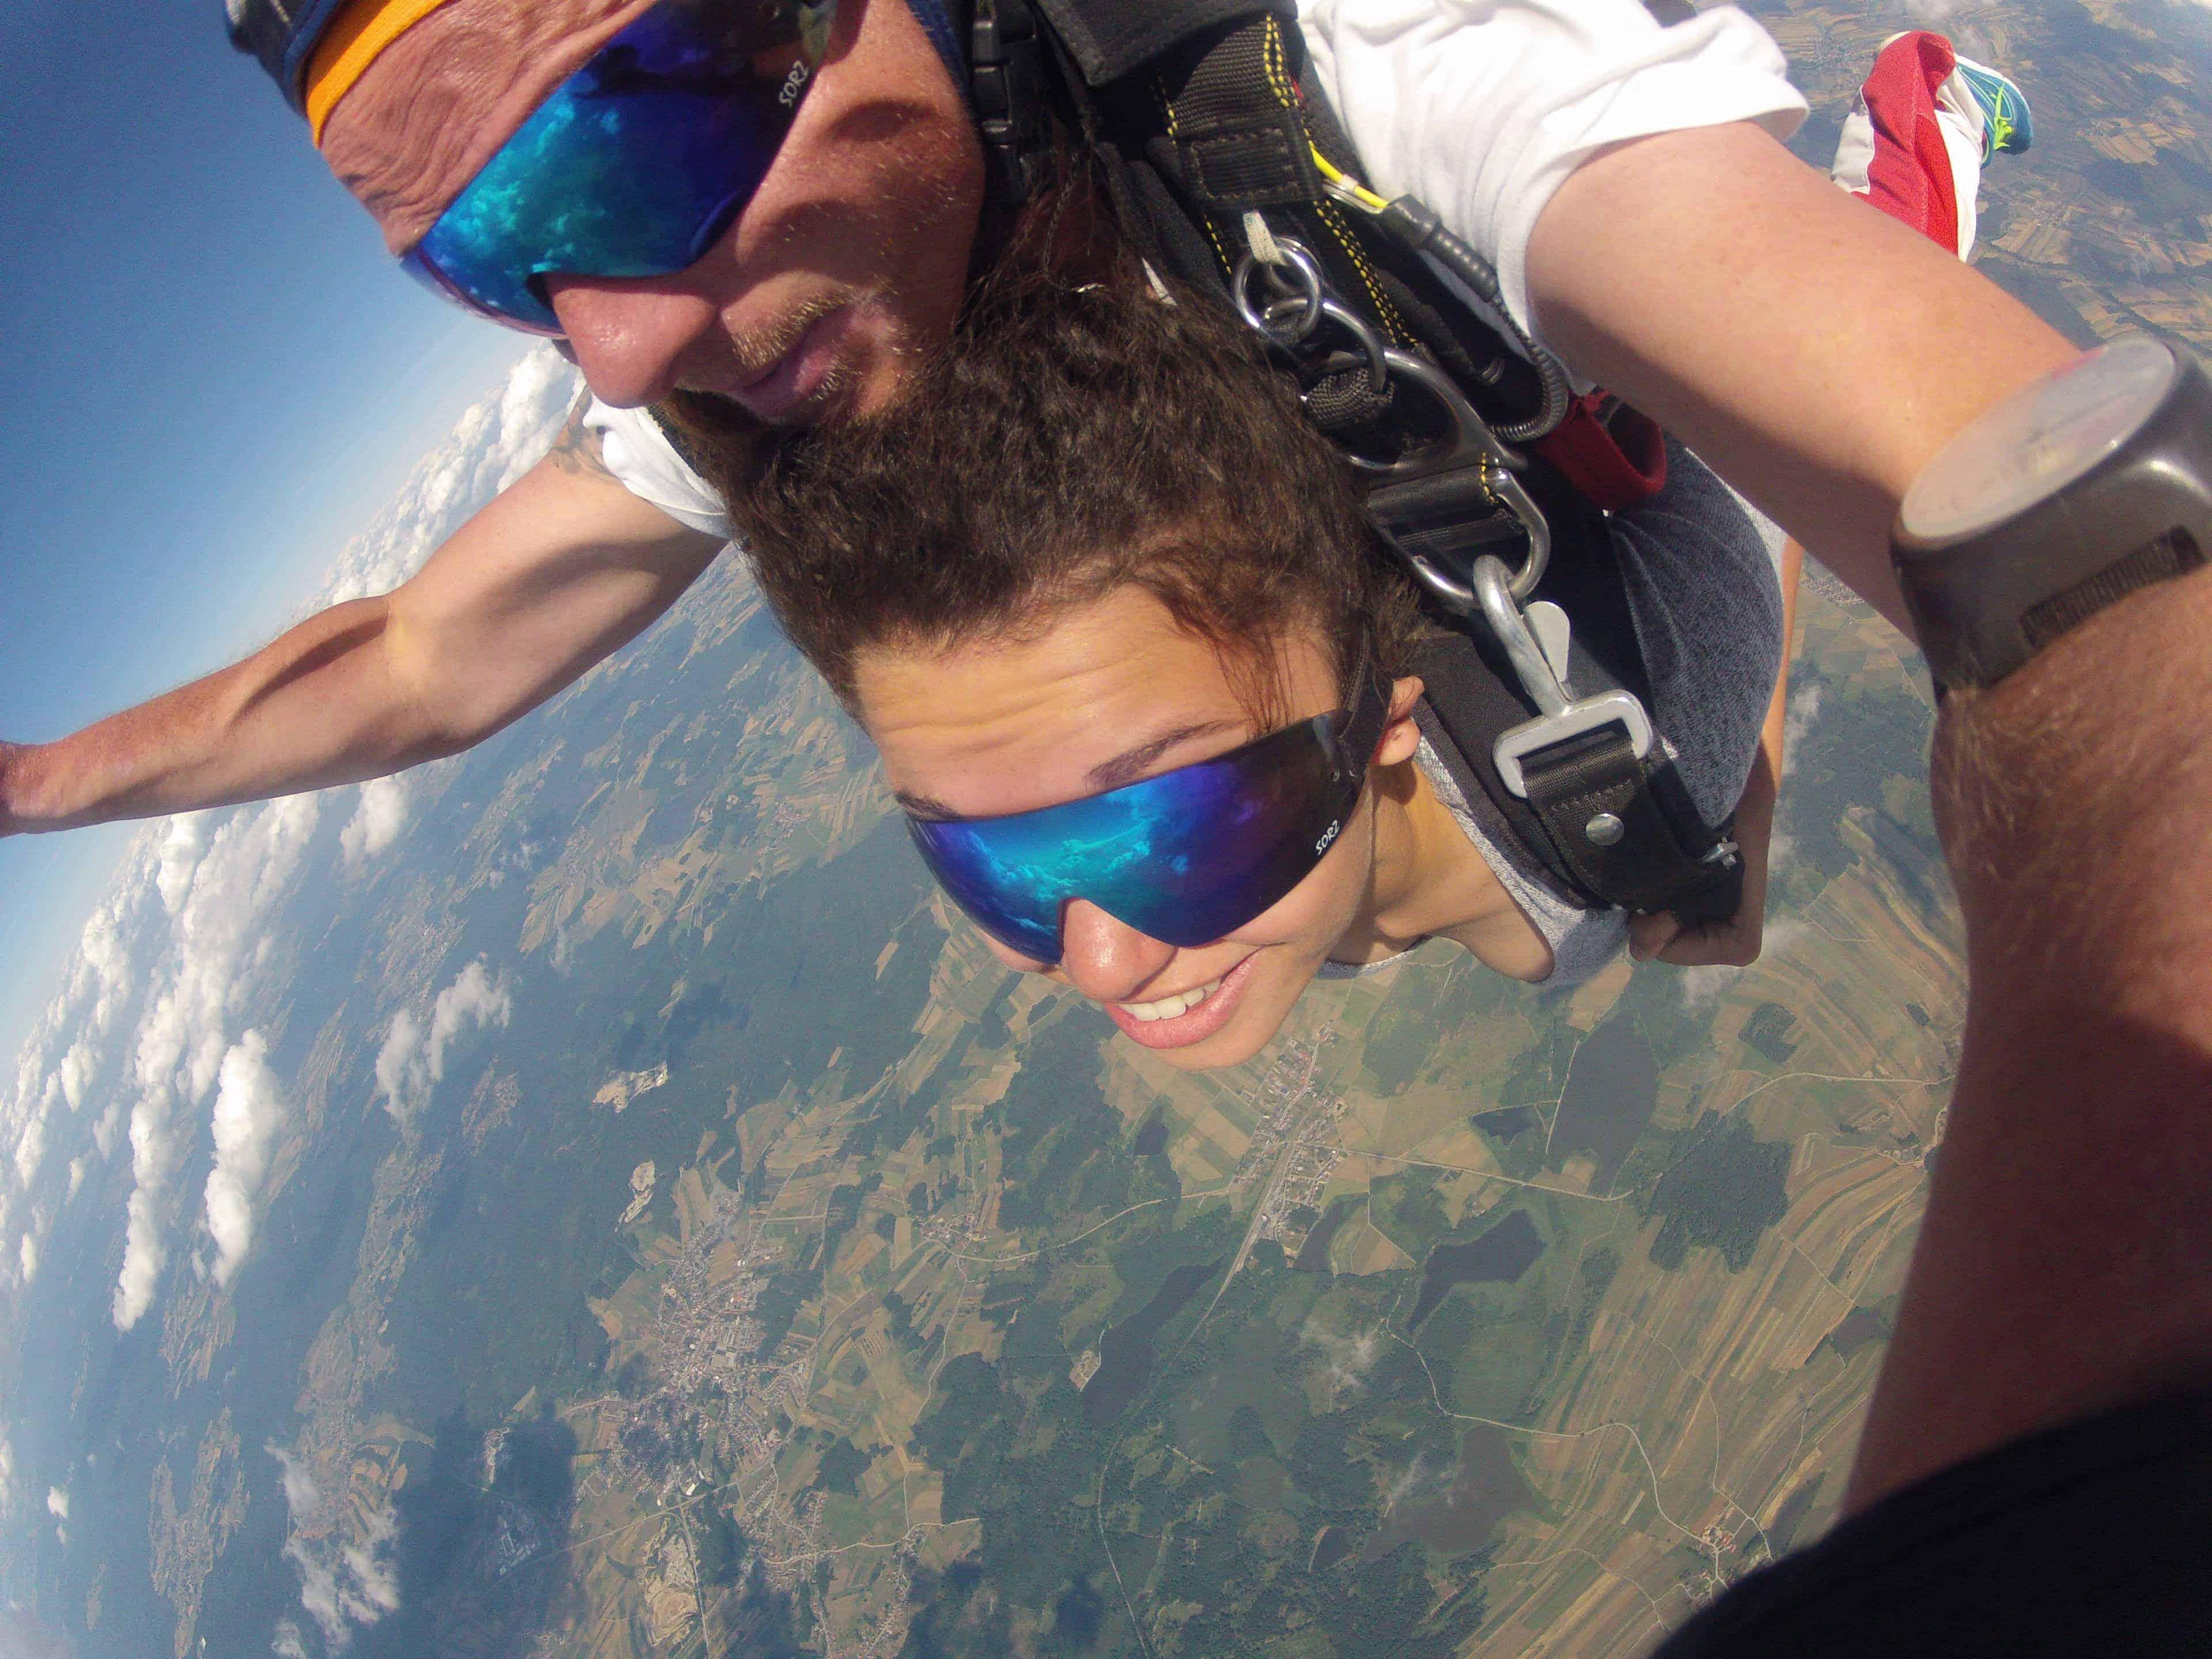 Fallschirmspringen Nrw Tandemsprung